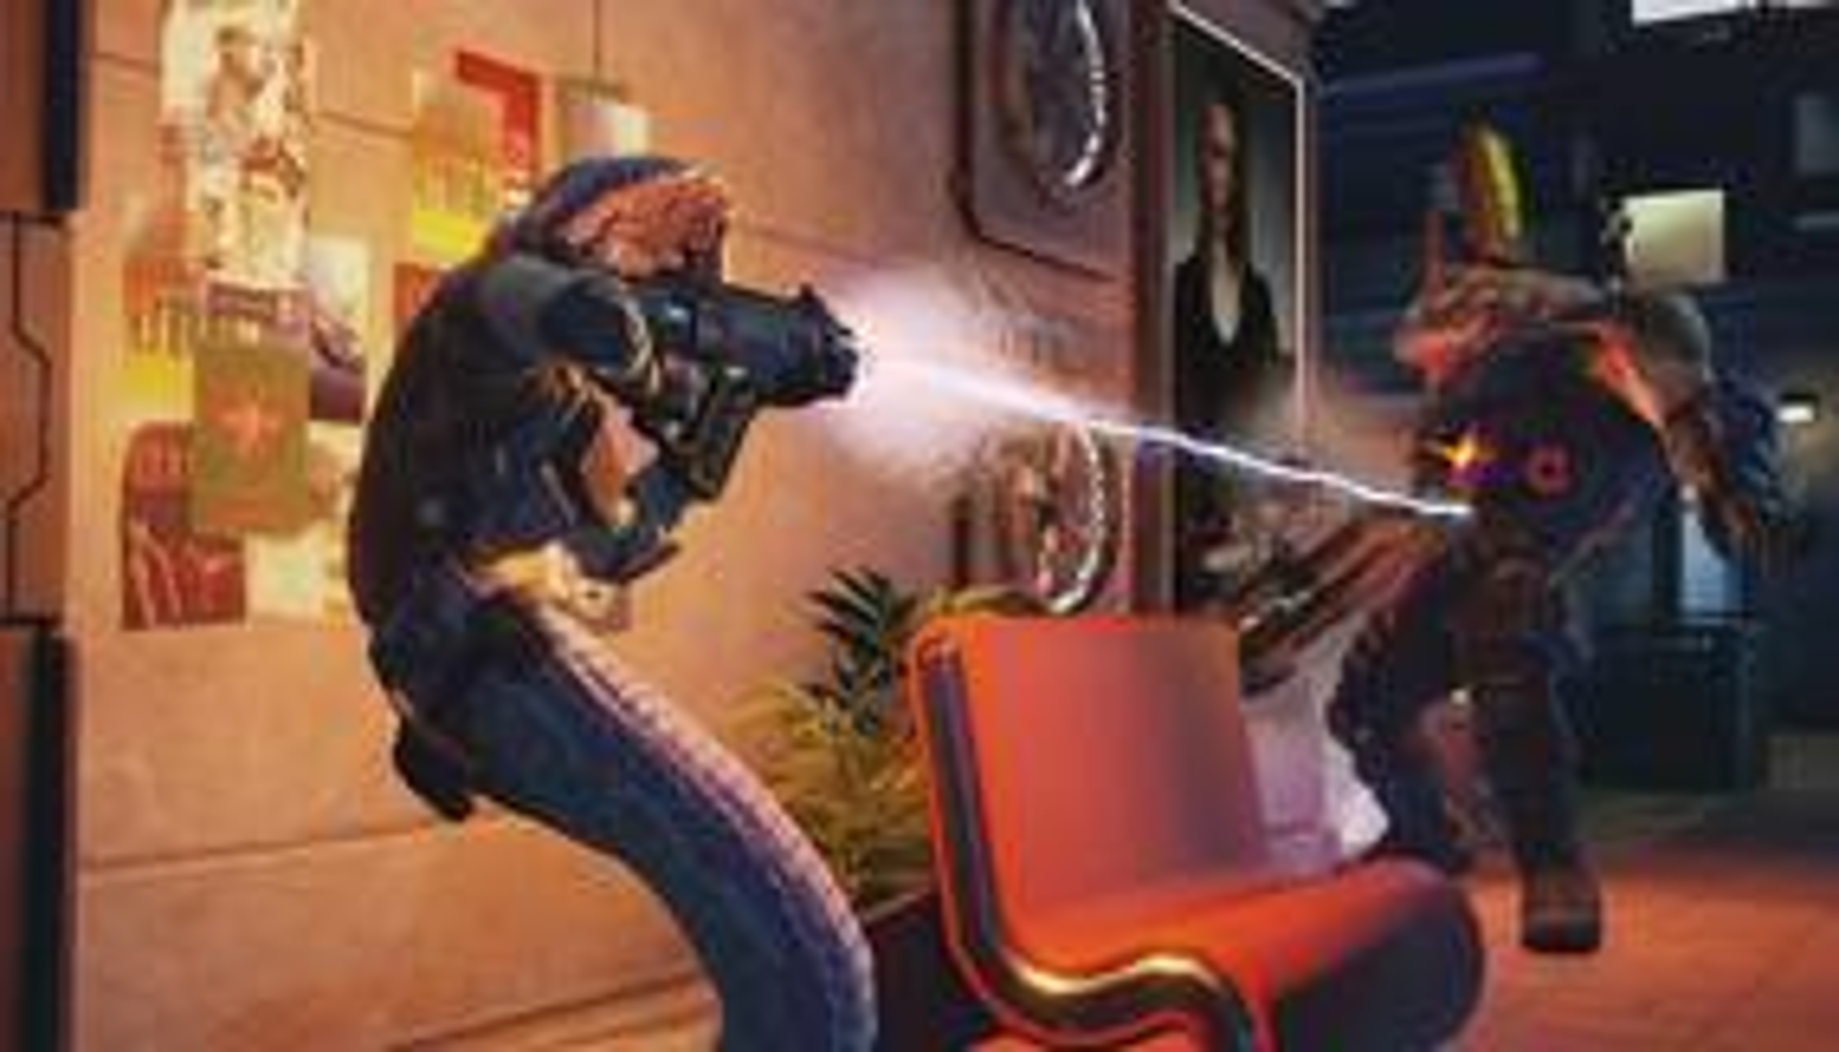 Image for XCOM: Chimera Squad reviews round up - all the scores